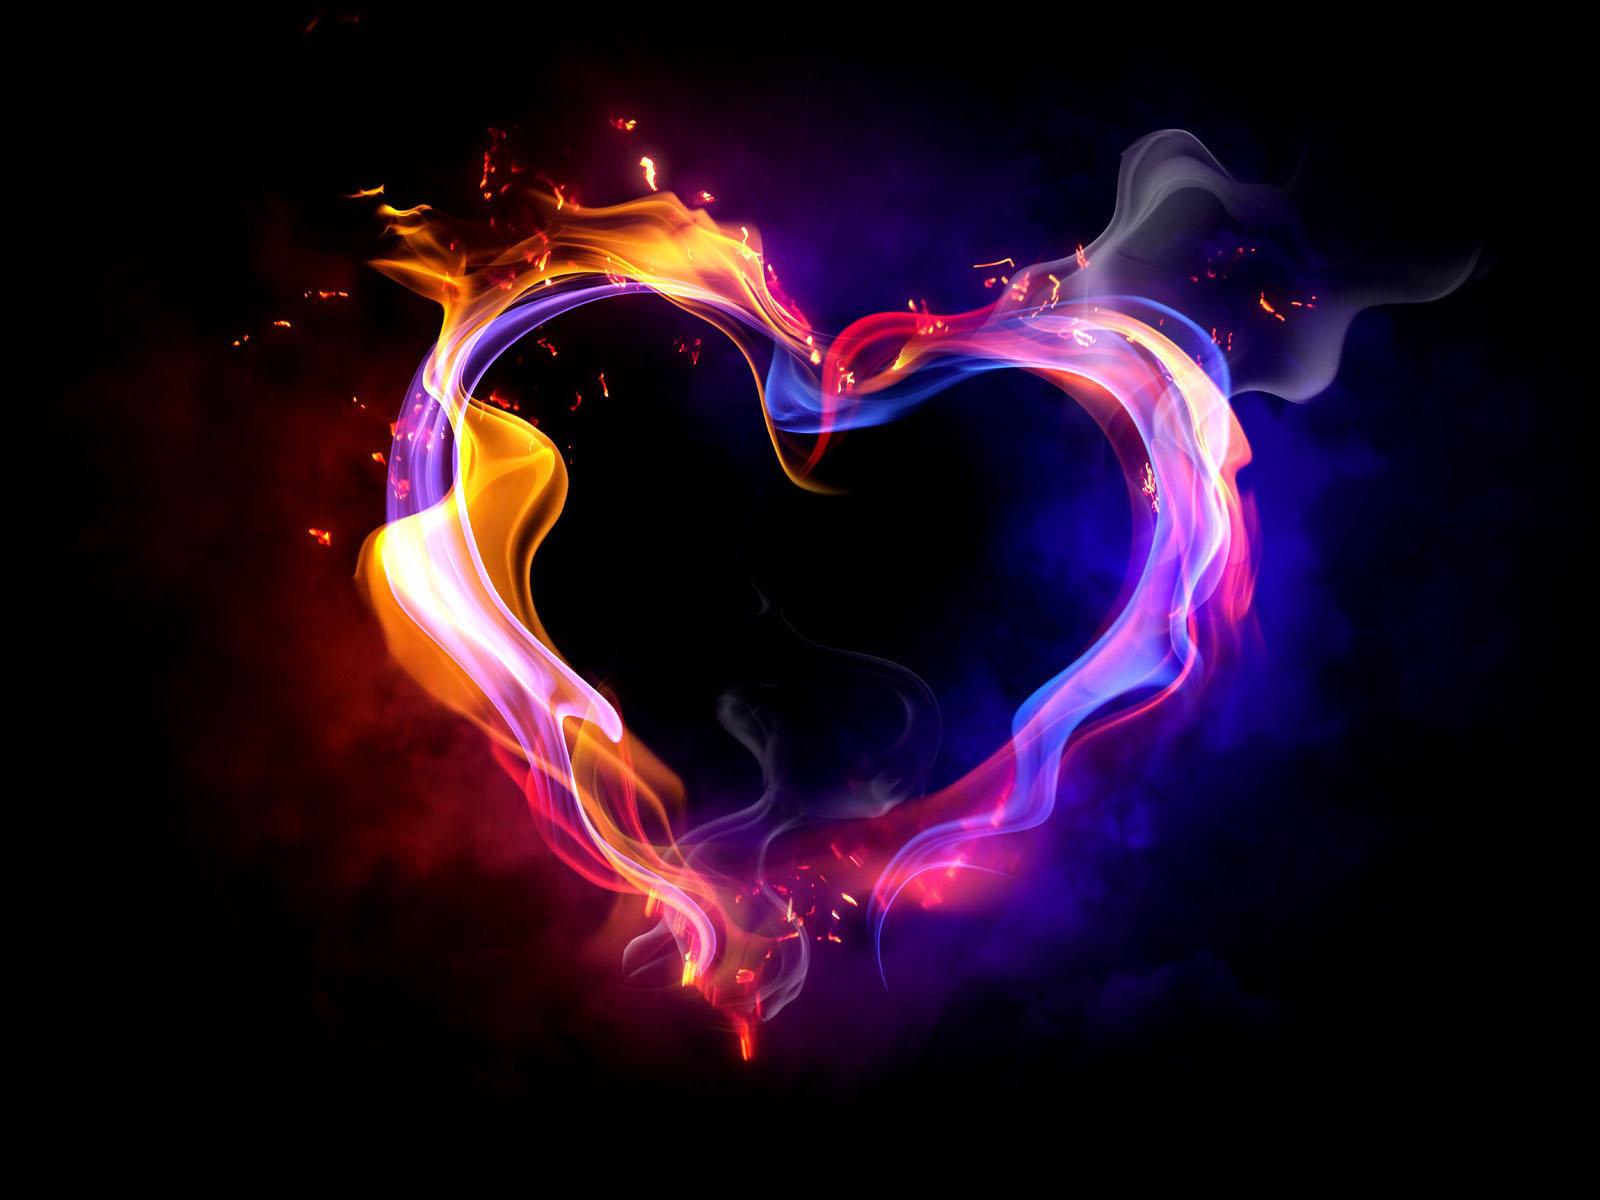 Hearts 3d Image Hd